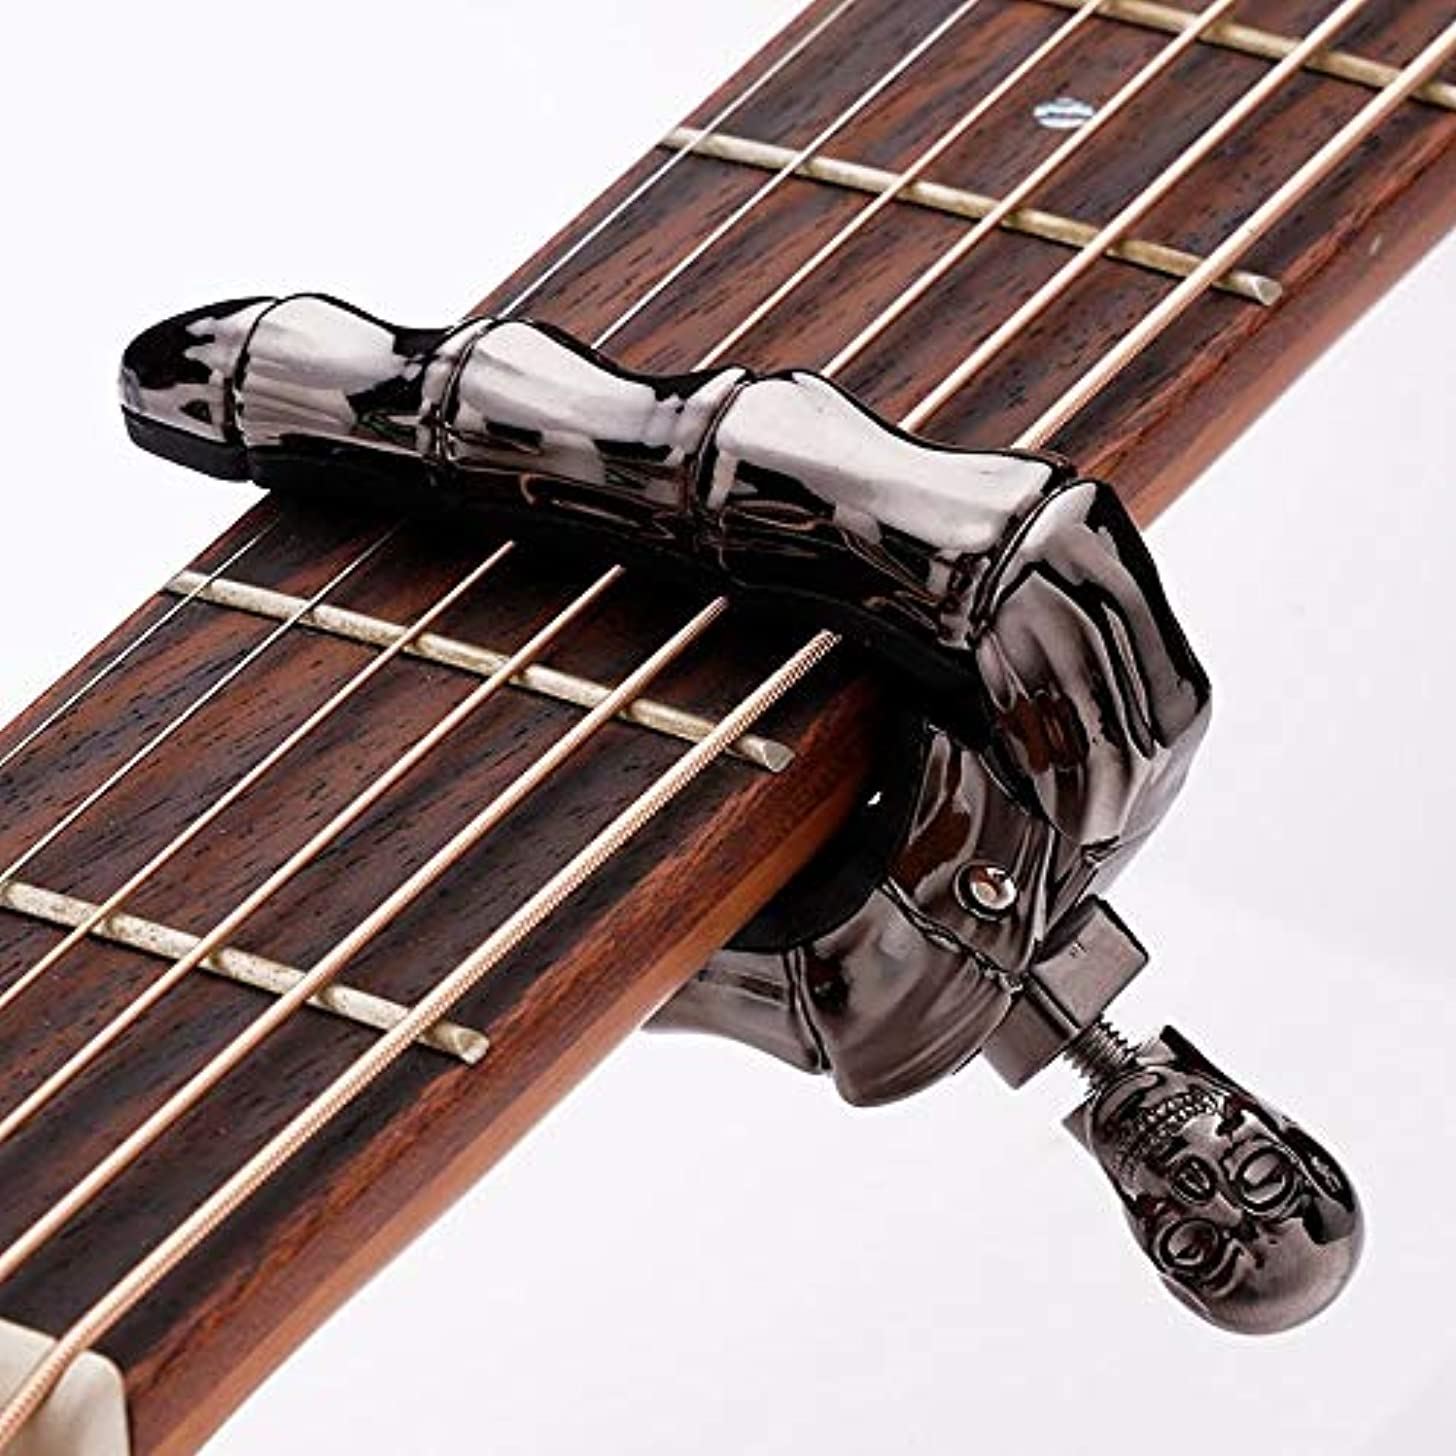 guitar capo Ghost Skull Finger Personalized Guitar Capo For Classic Acoustic Electric Guitar Metal Guitar Tuner Capo GuitarParts Accessories